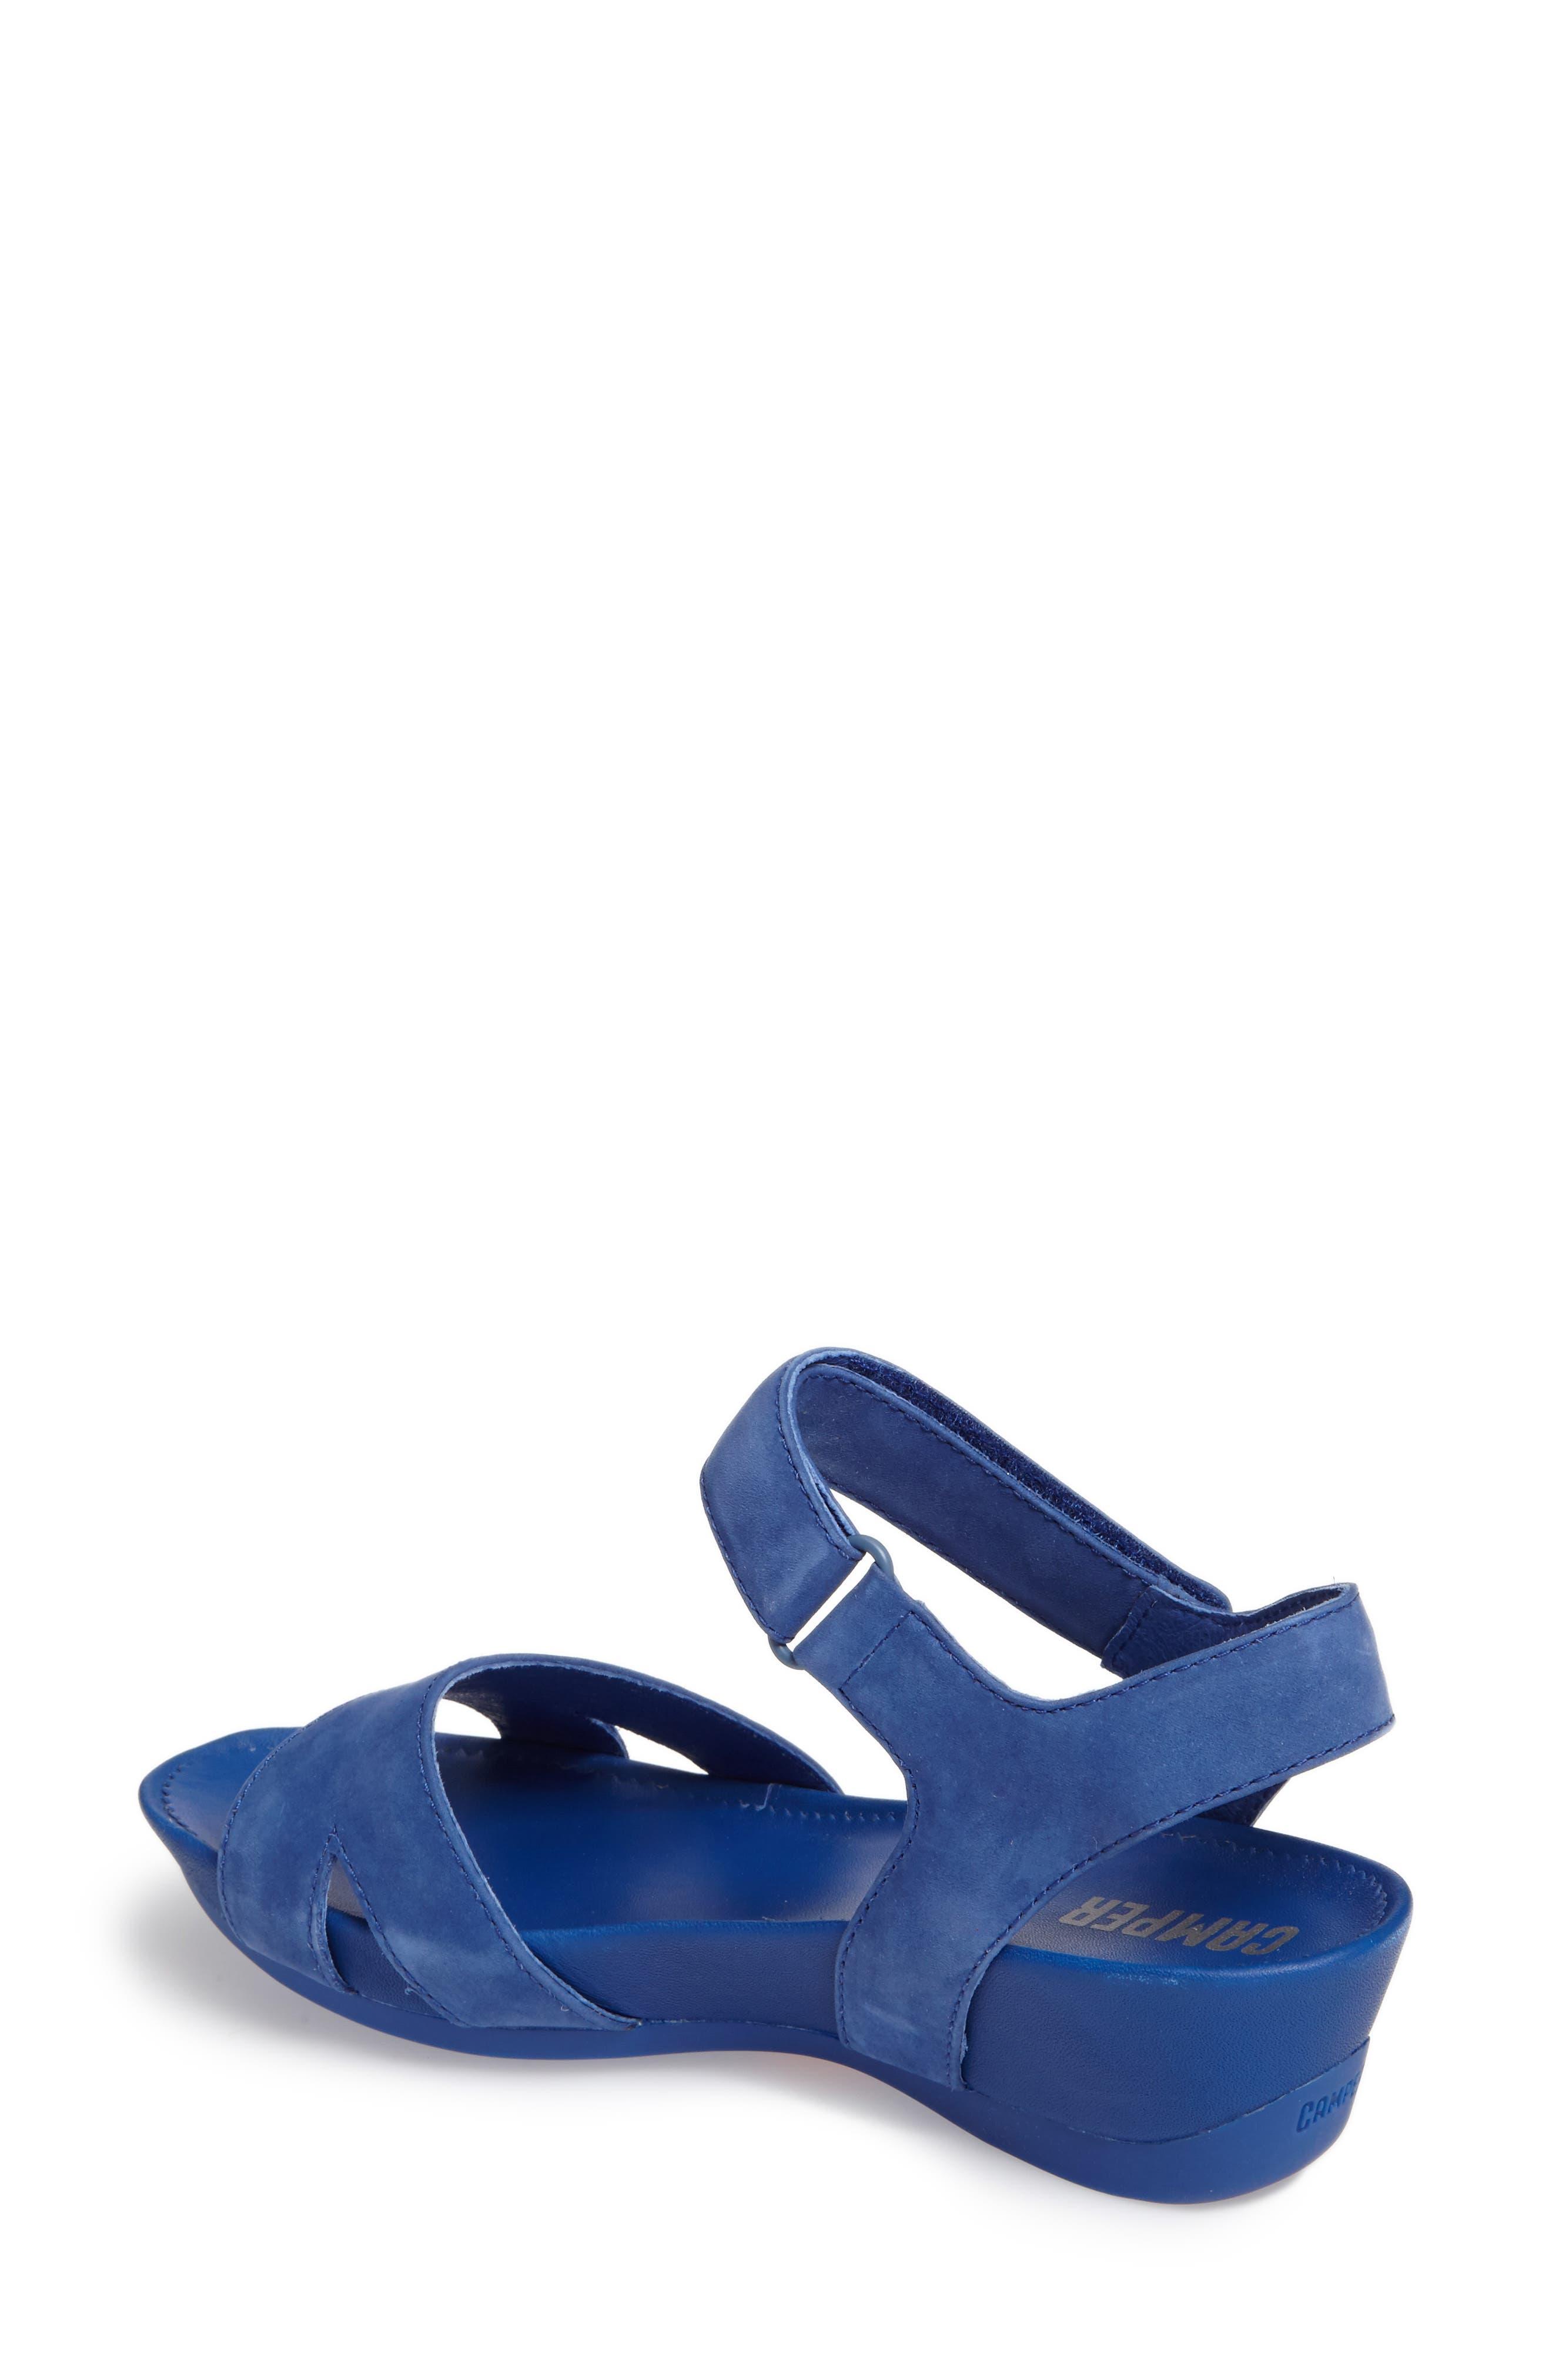 'Micro' Sandal,                             Alternate thumbnail 2, color,                             Blue Leather